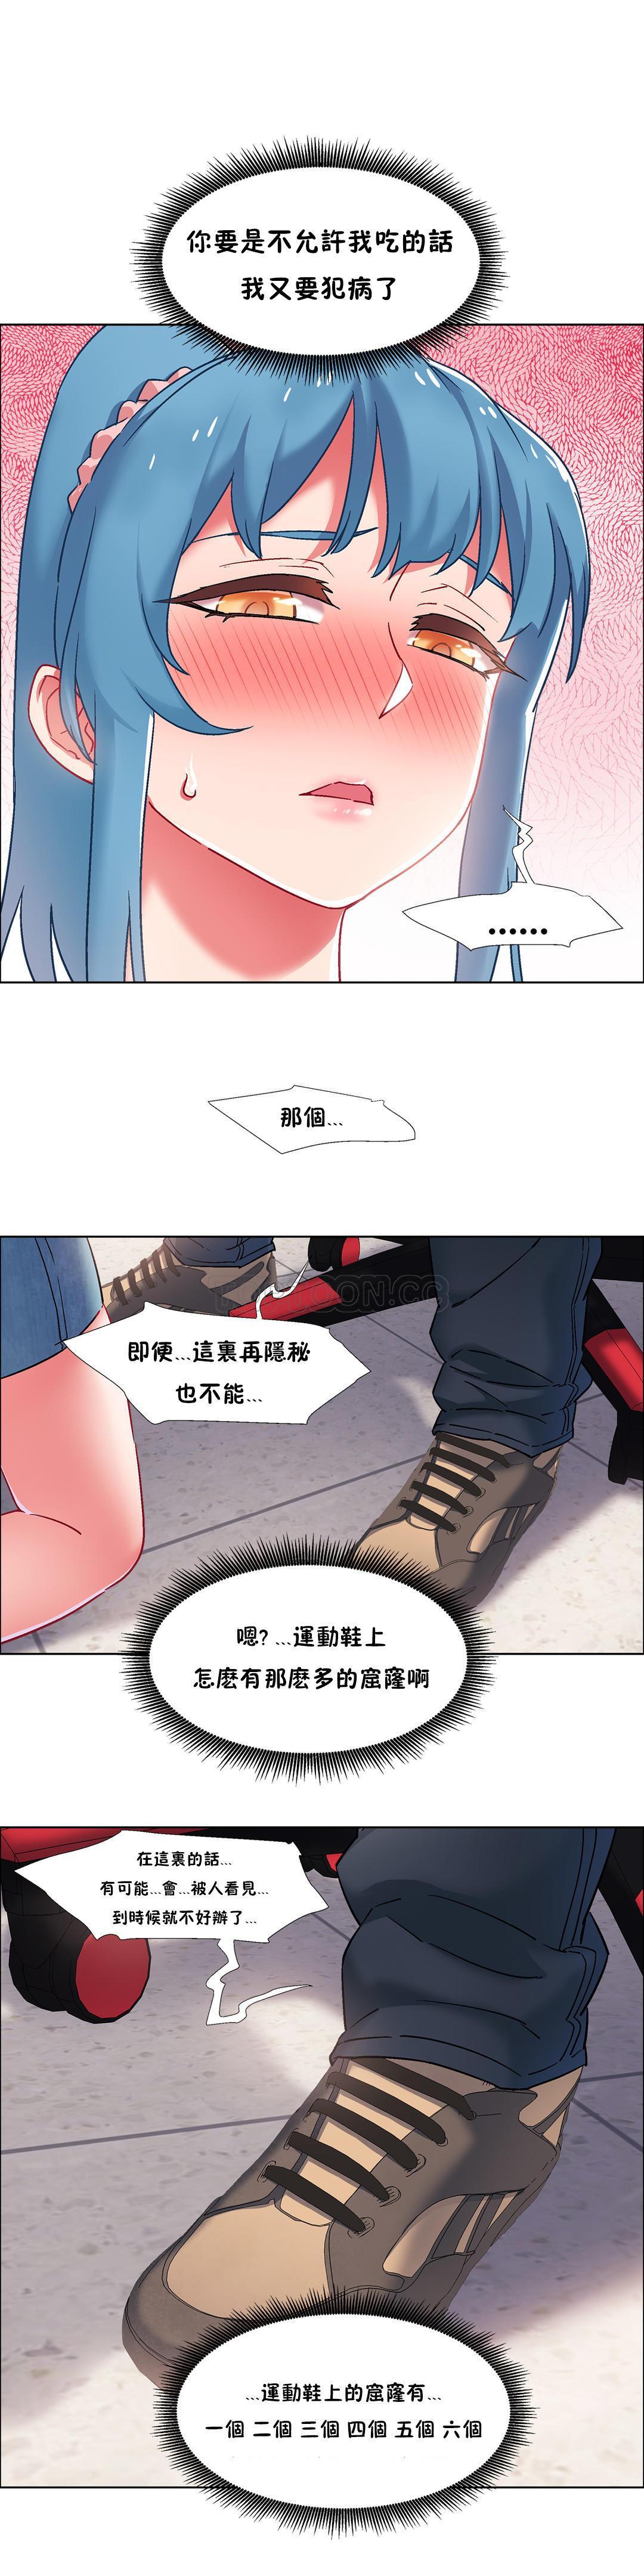 [Studio Wannabe] Rental Girls | 出租女郎 Ch. 33-58 [Chinese]  第二季 完结 109